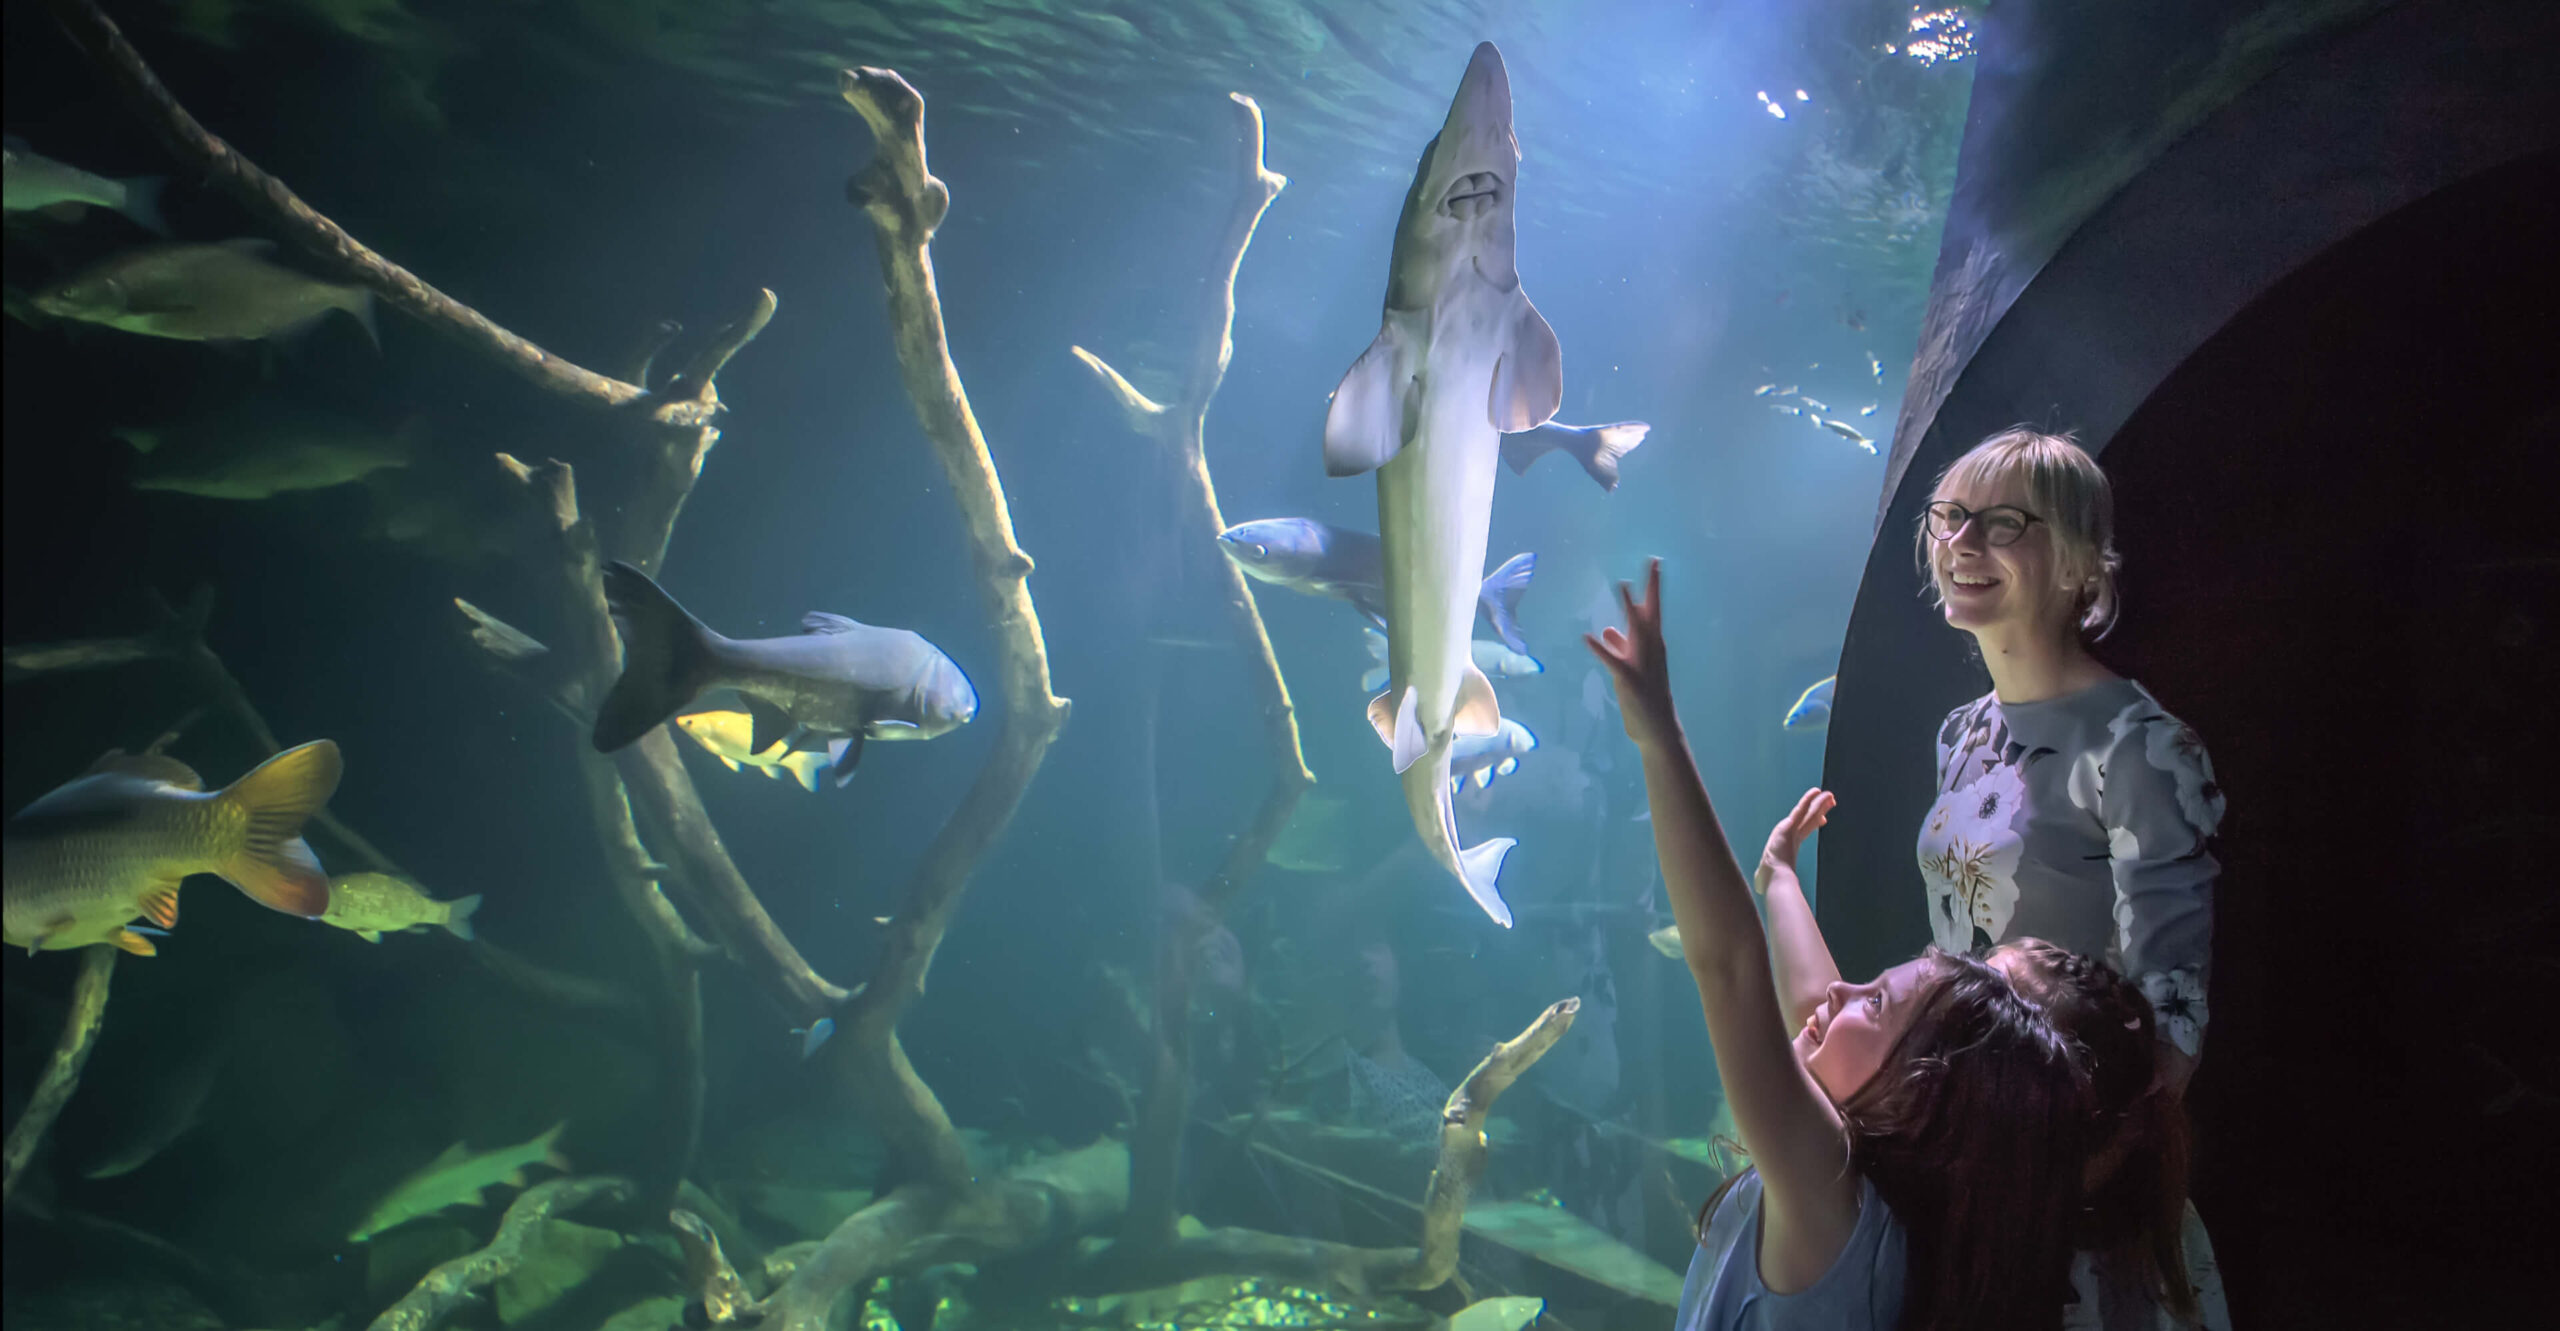 Aquarium Karlovac